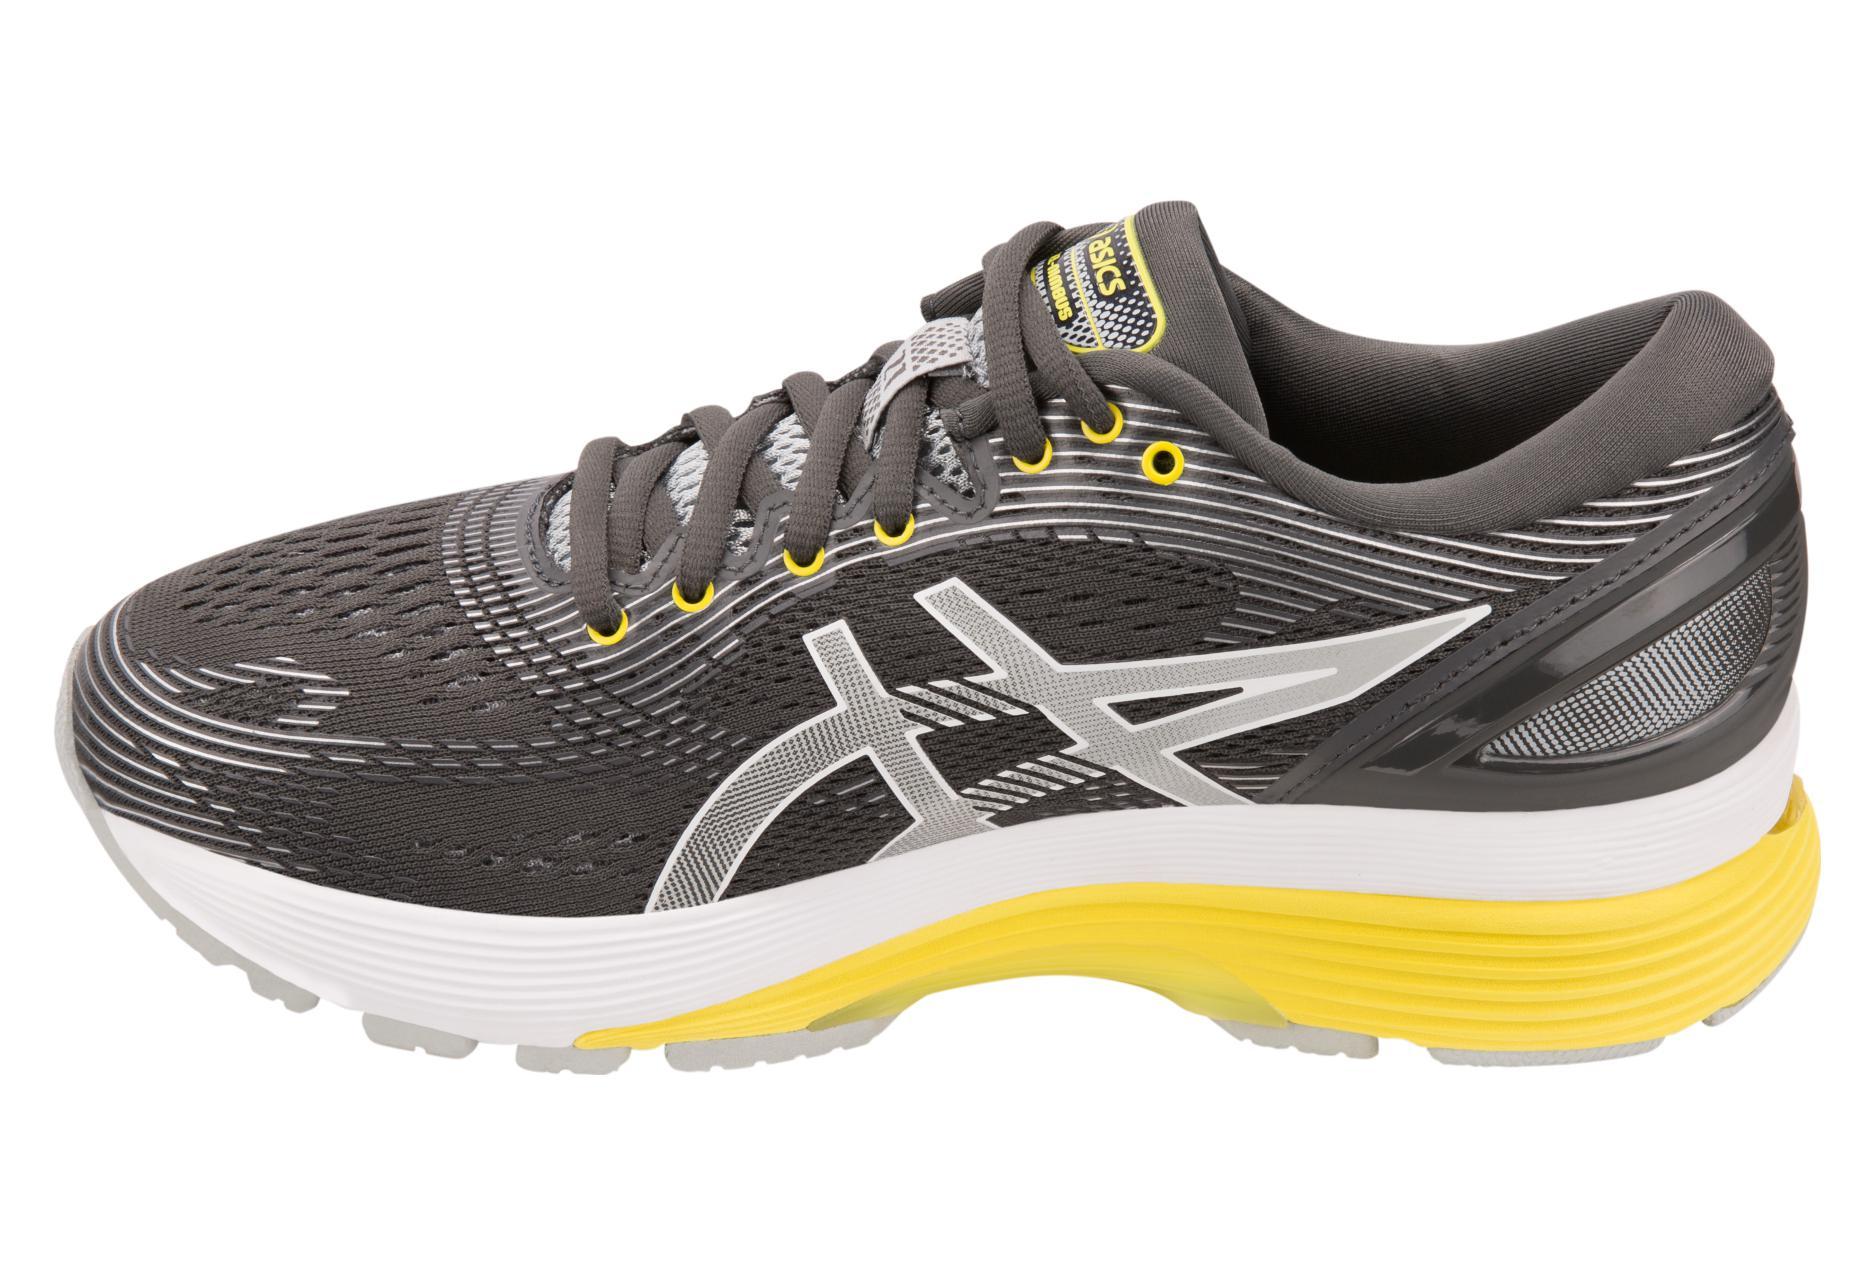 Asics Shoes Run Gel Nimbus 21 Grey Yellow Women 40